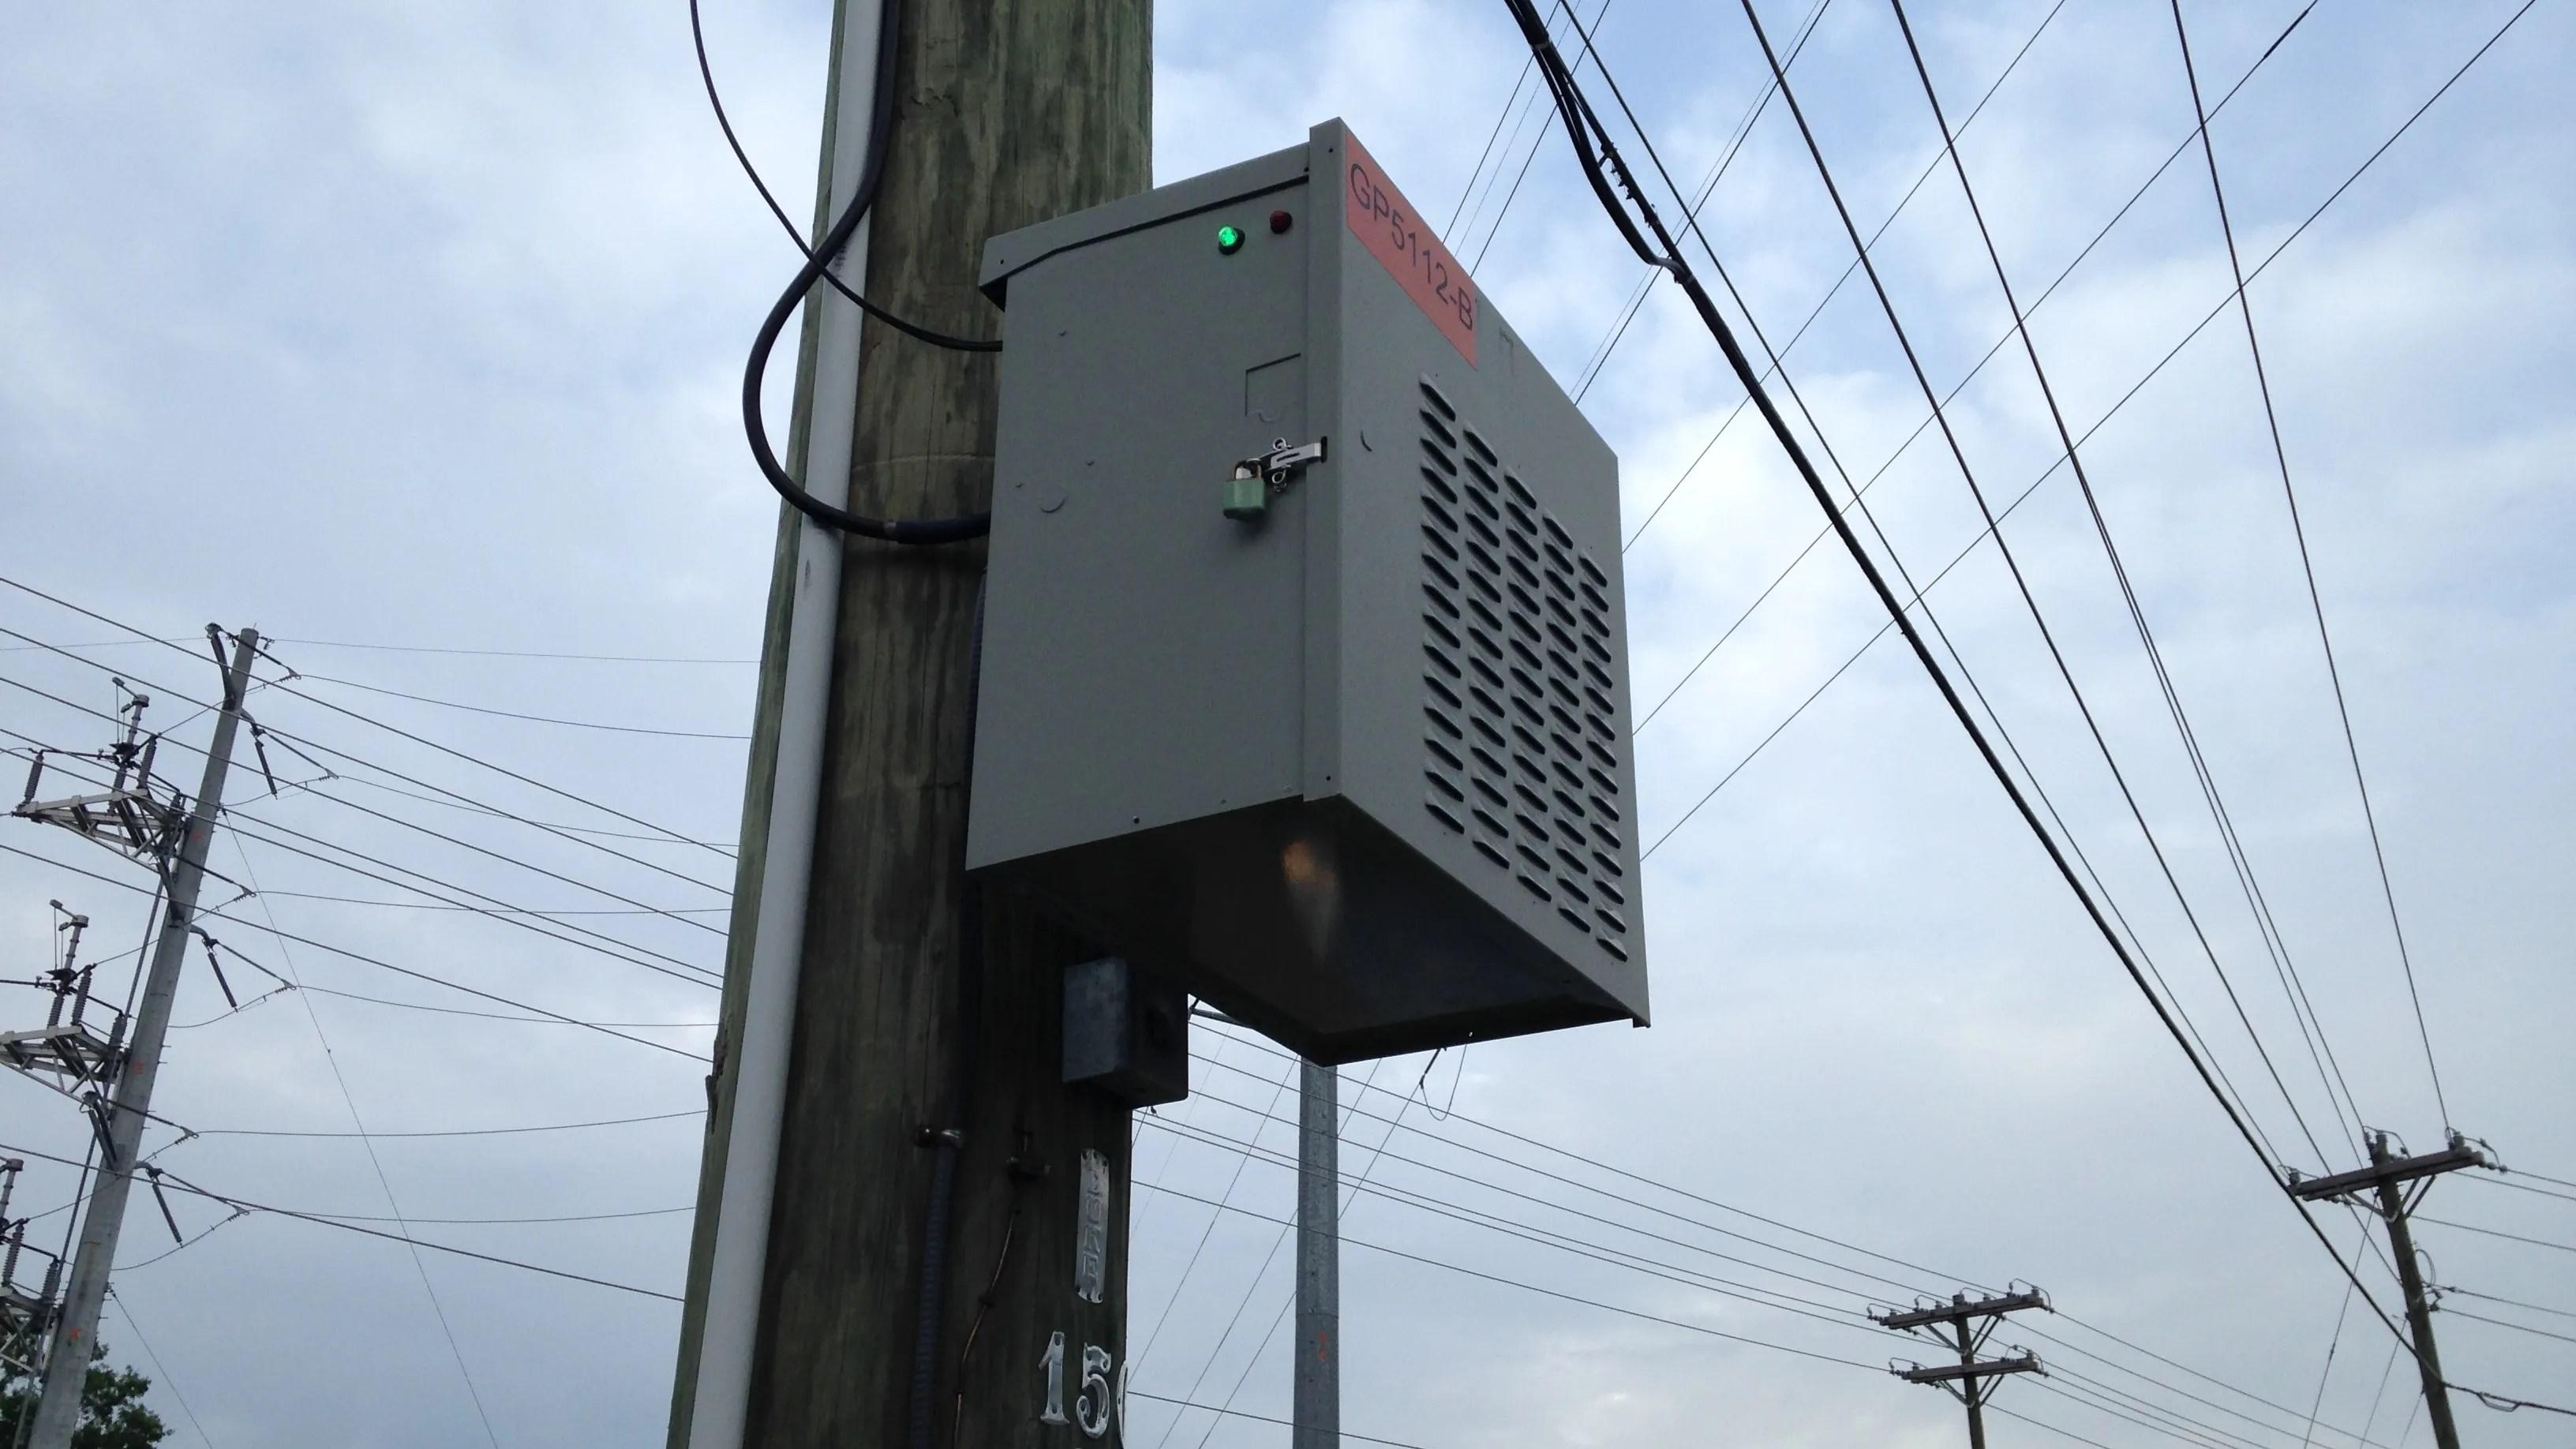 hight resolution of pole box